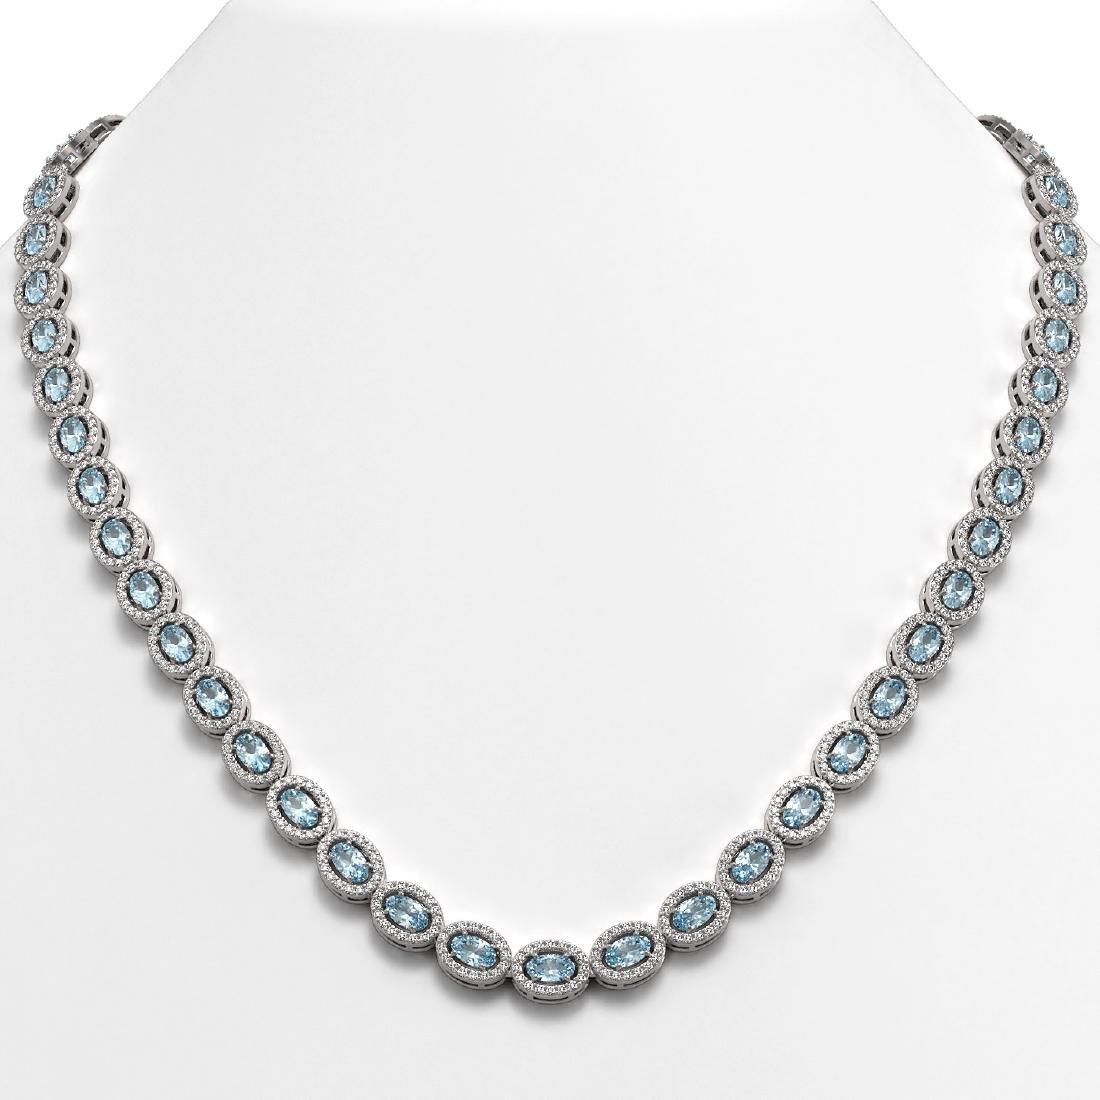 20.71 CTW Aquamarine & Diamond Halo Necklace 10K White